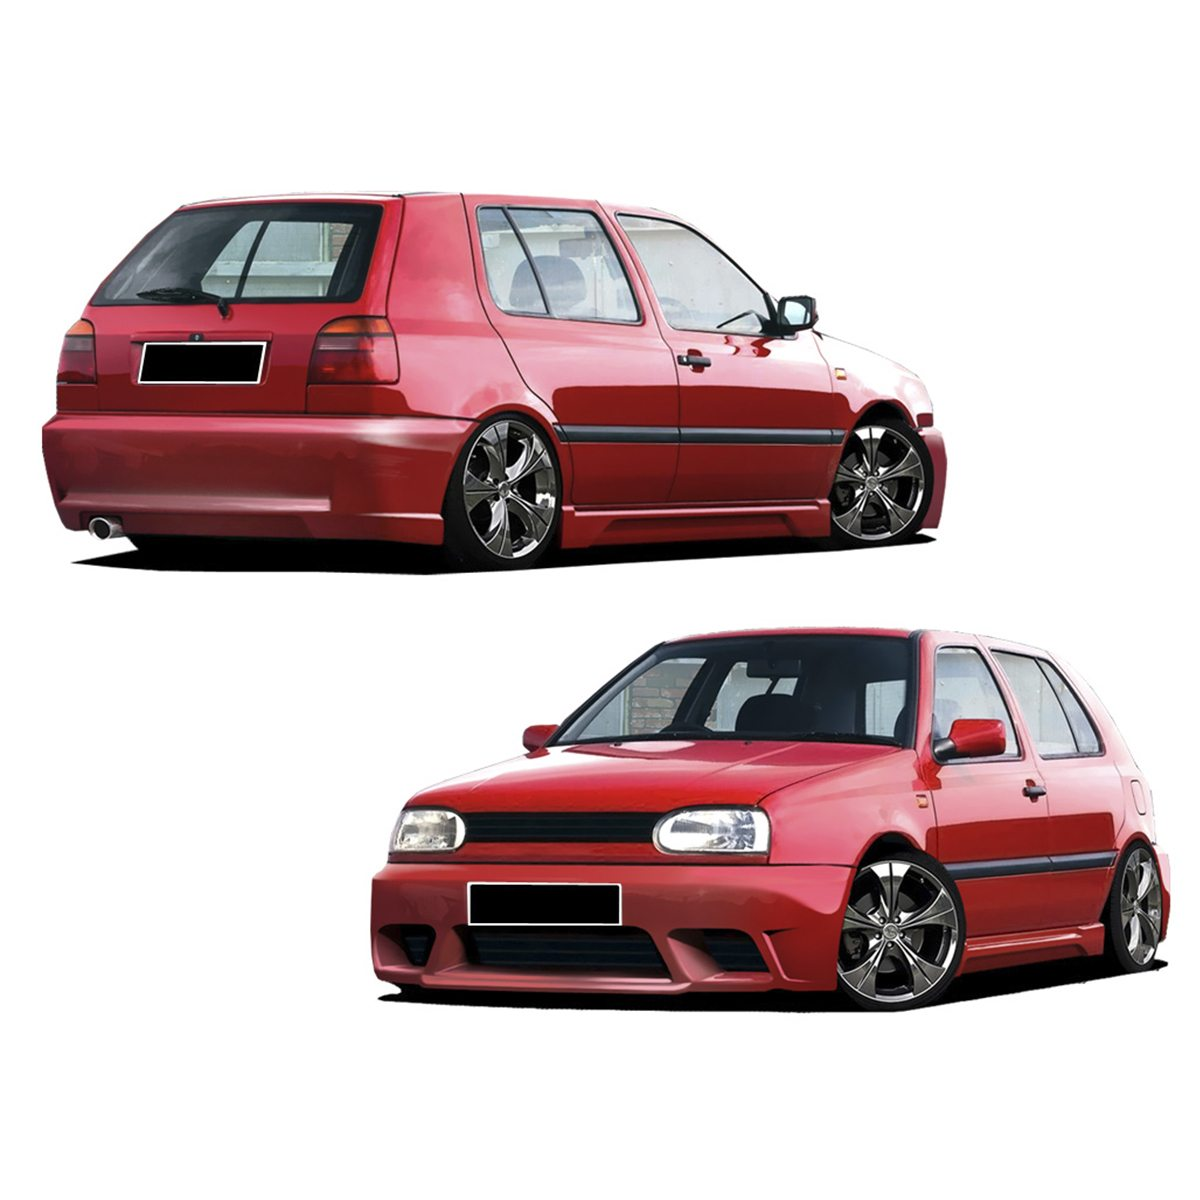 VW-Golf-III-Poison-KIT-KTR024